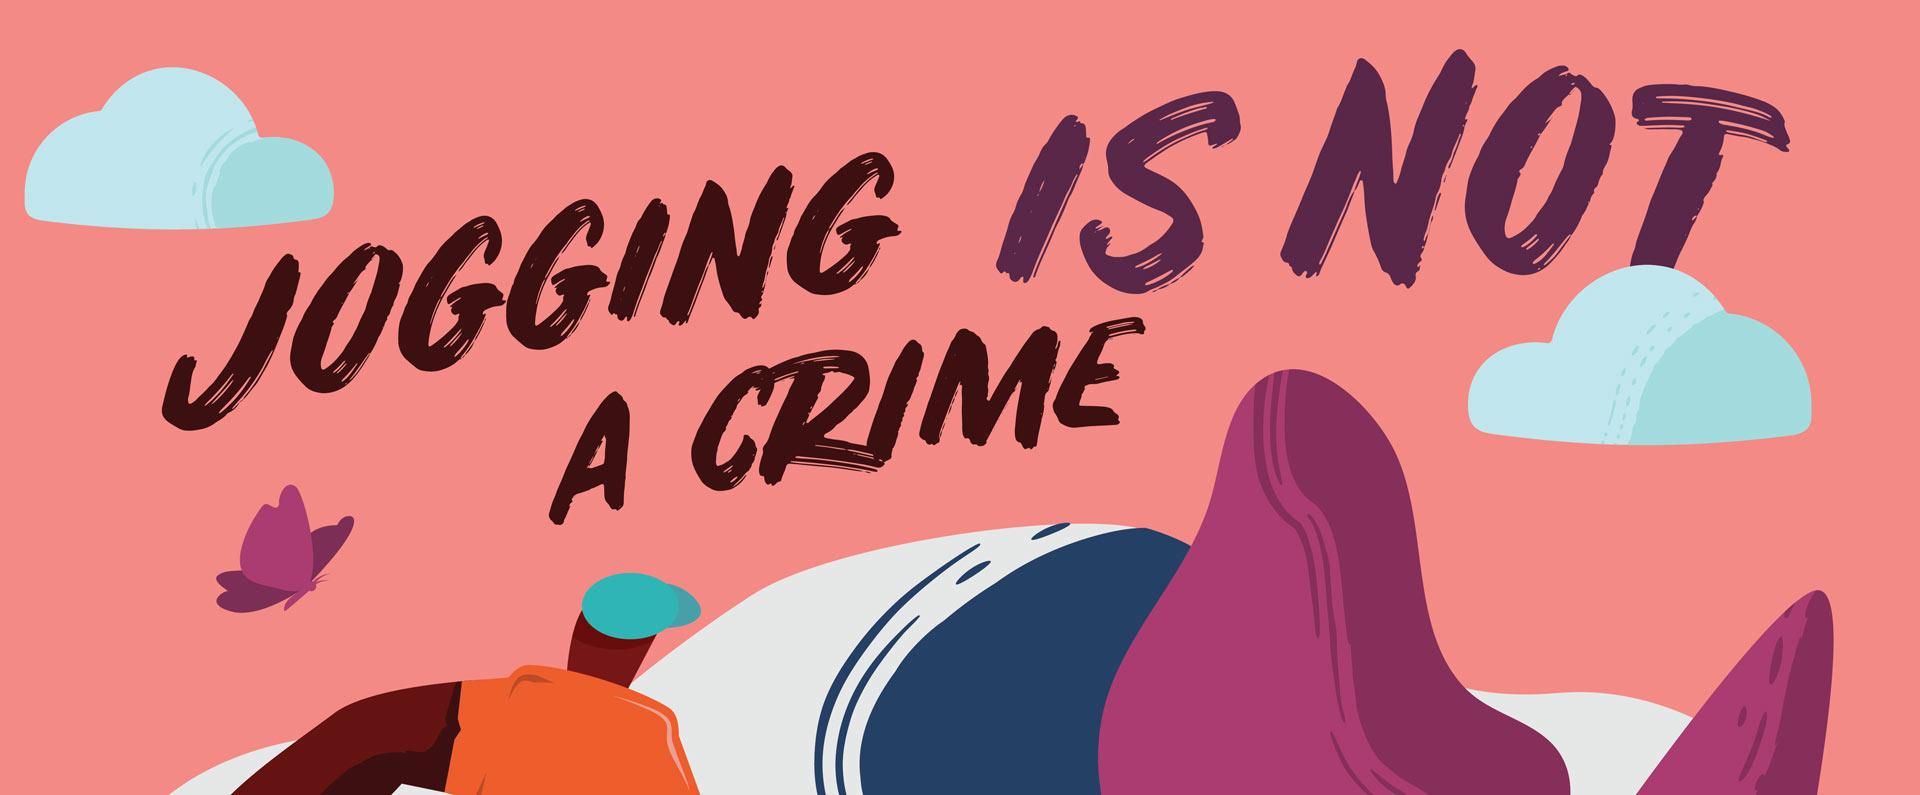 """Jogging is not a crime"" header."